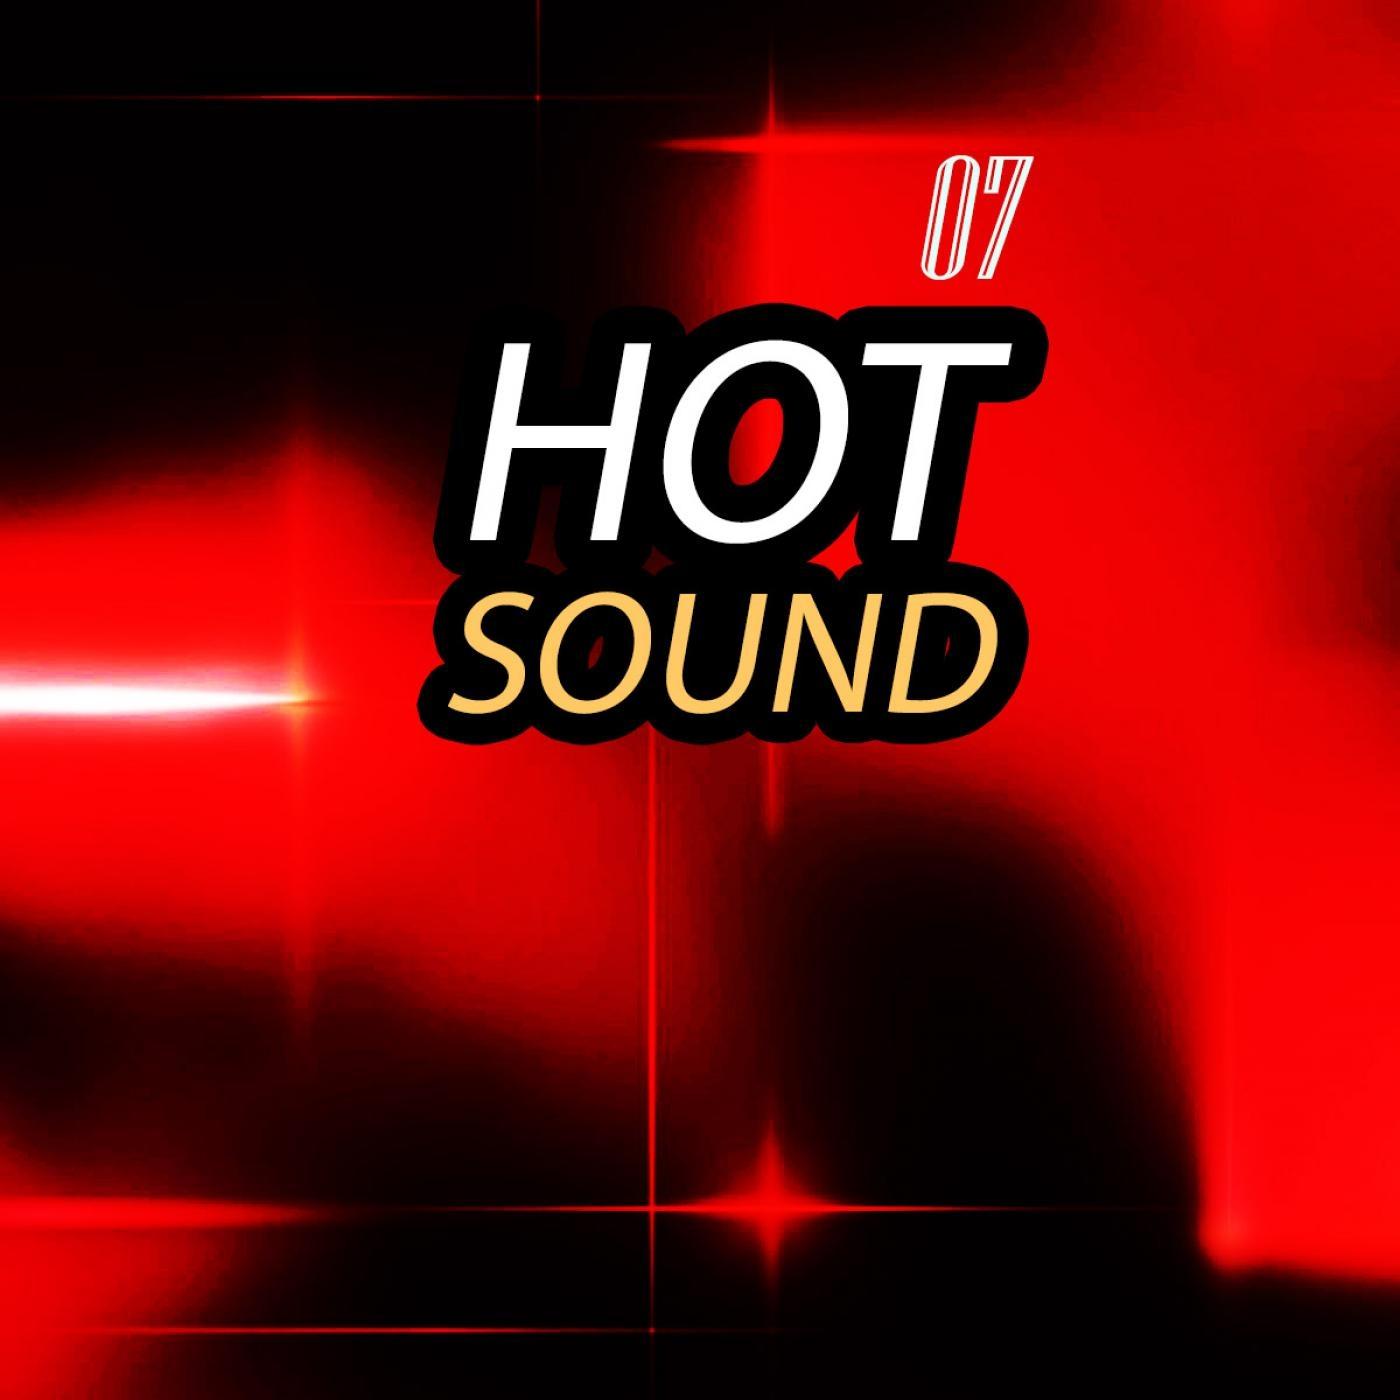 TimTaj - Voice of East (Original Mix)